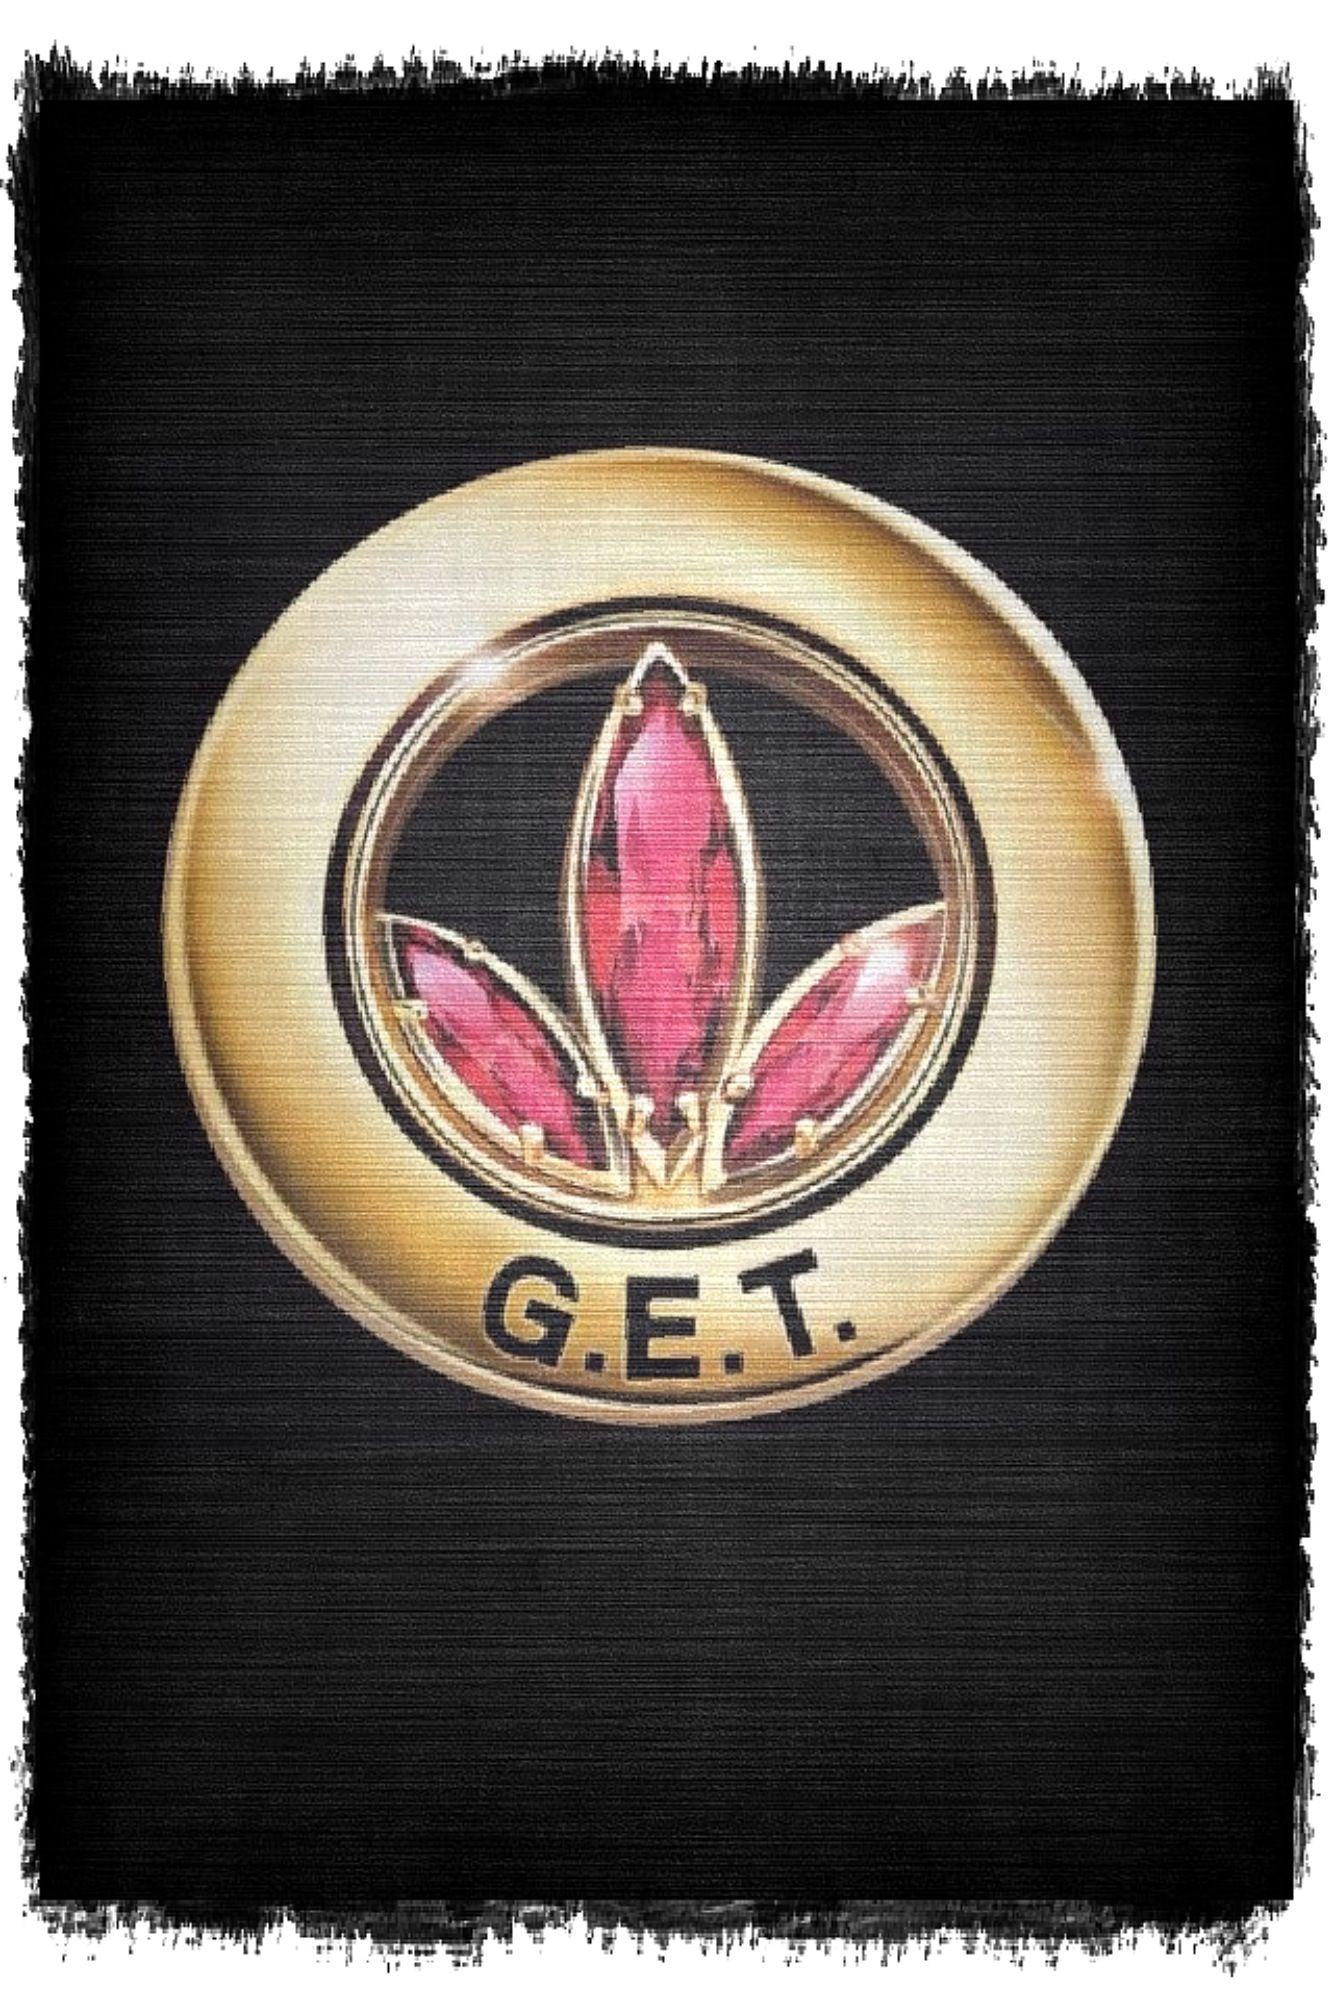 #Pin #Get | Herbalife, I'm Independent Distributor..! en ...